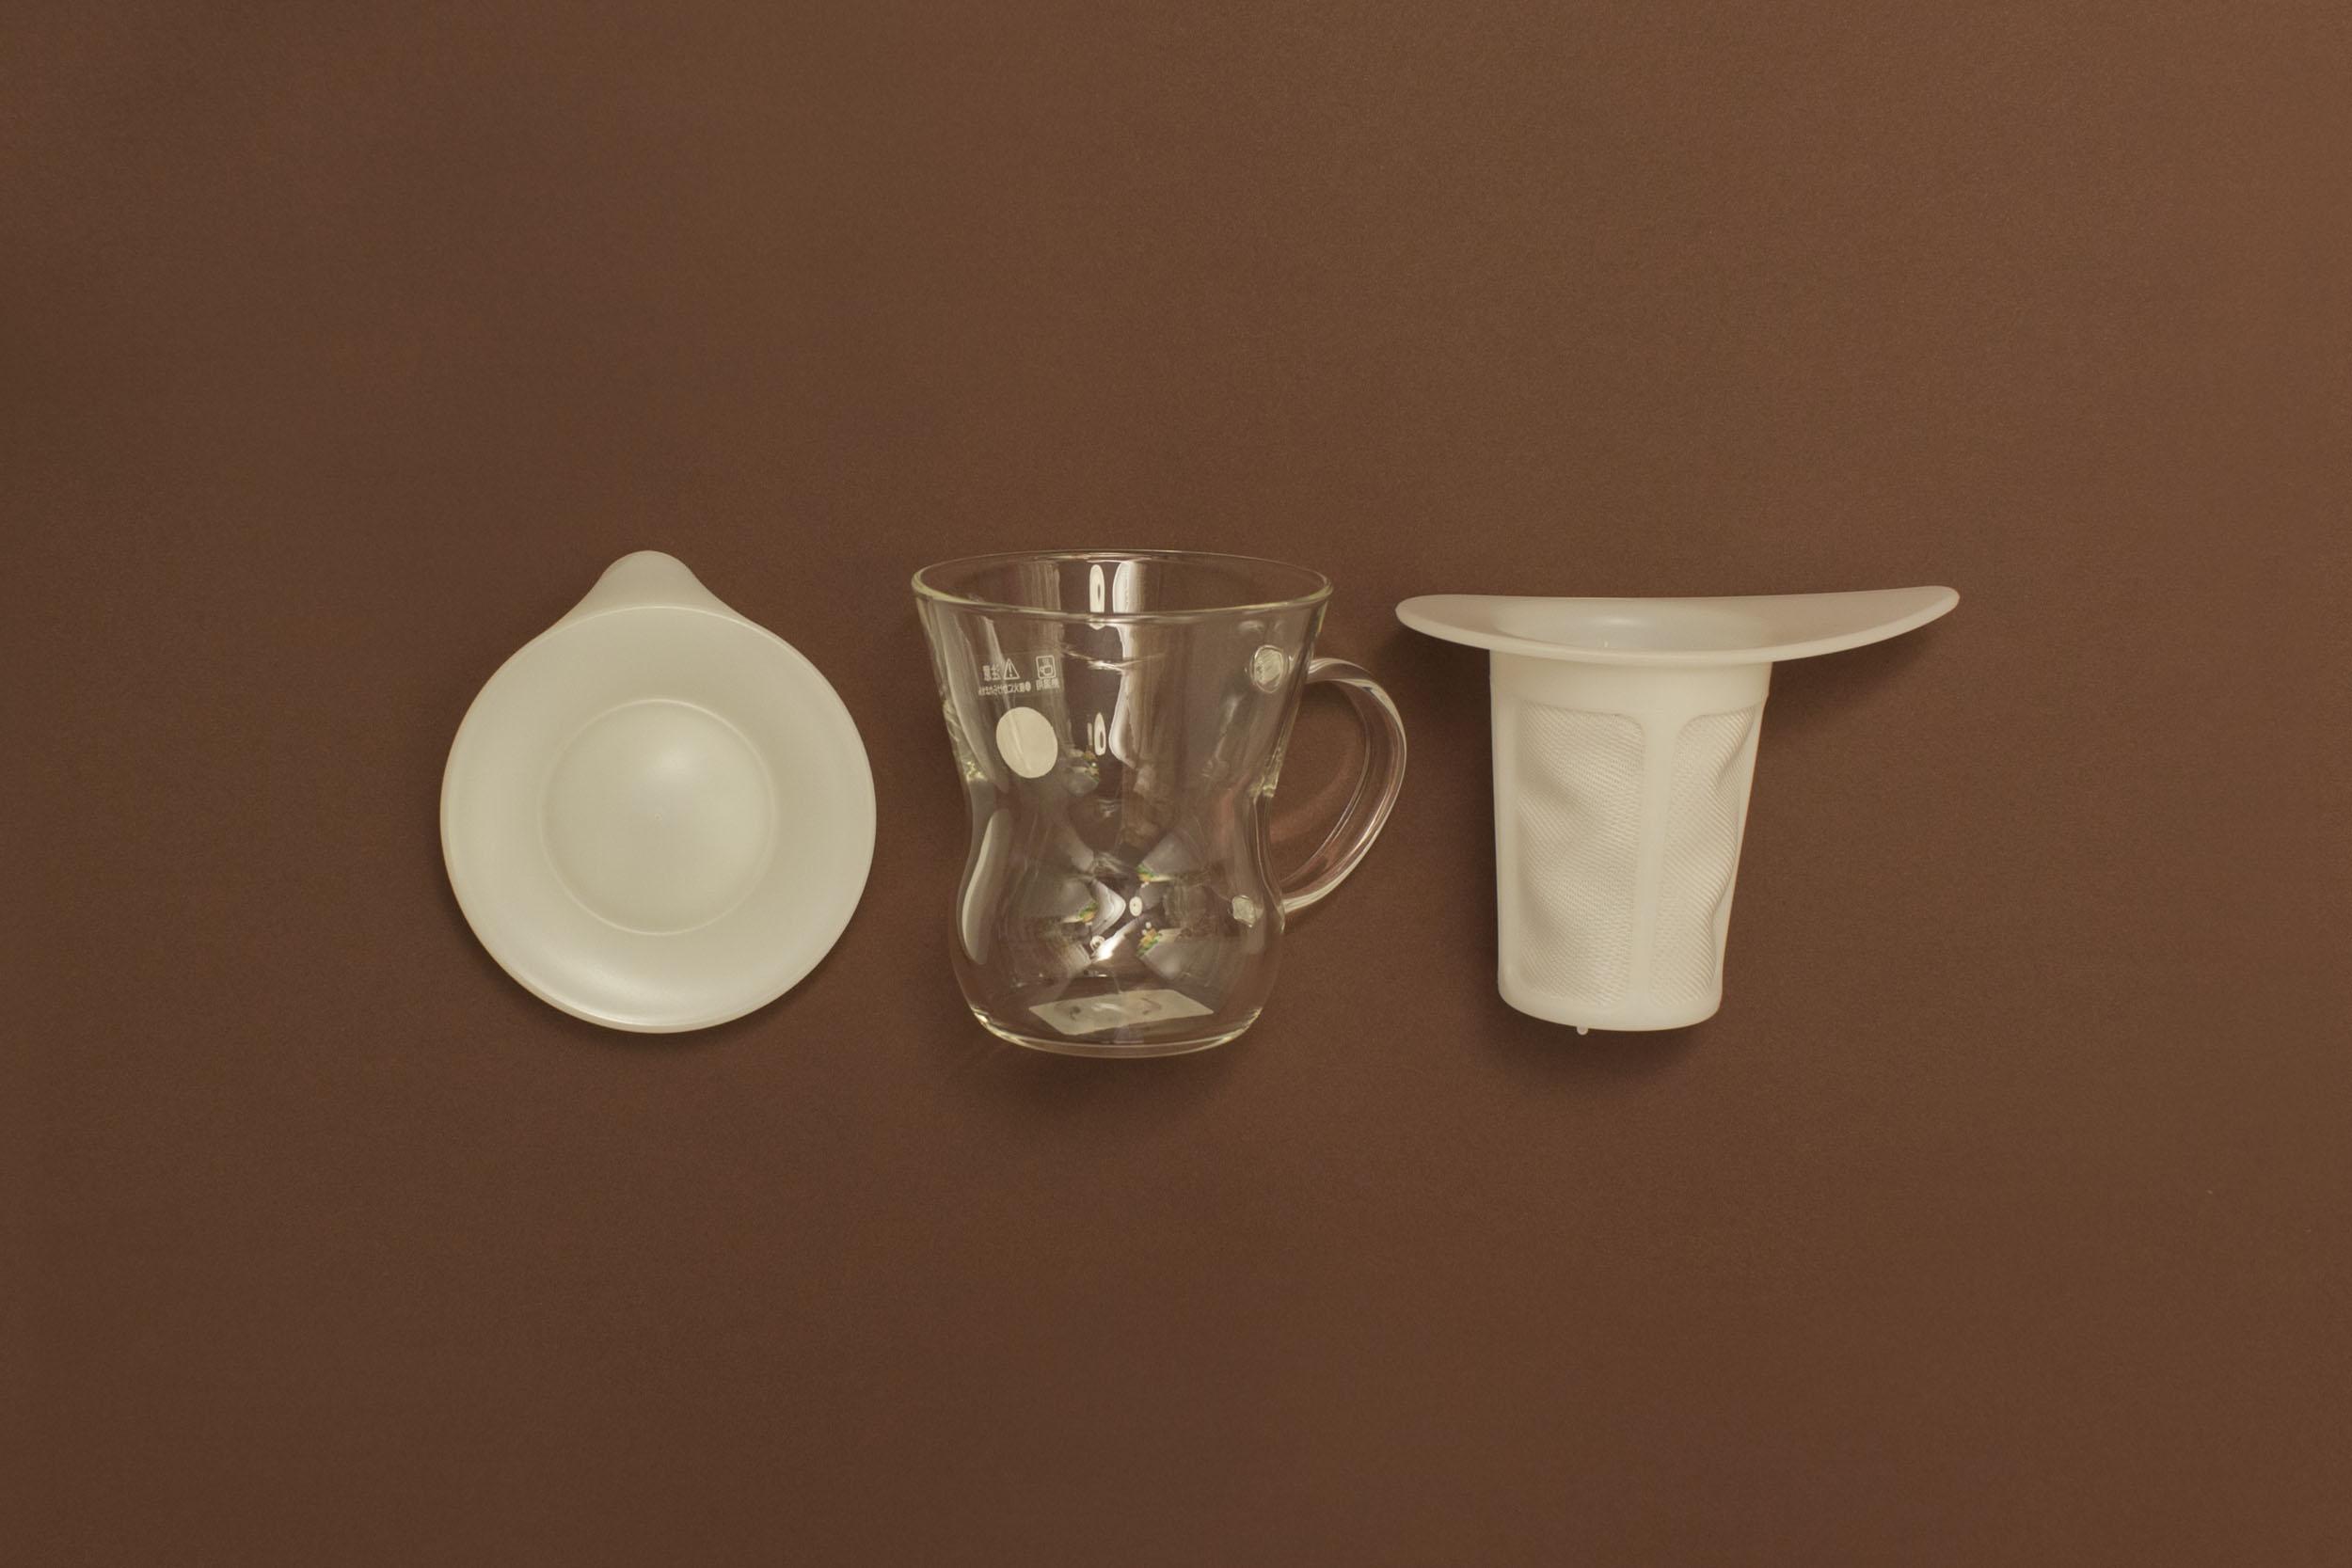 One Cup Tea Maker